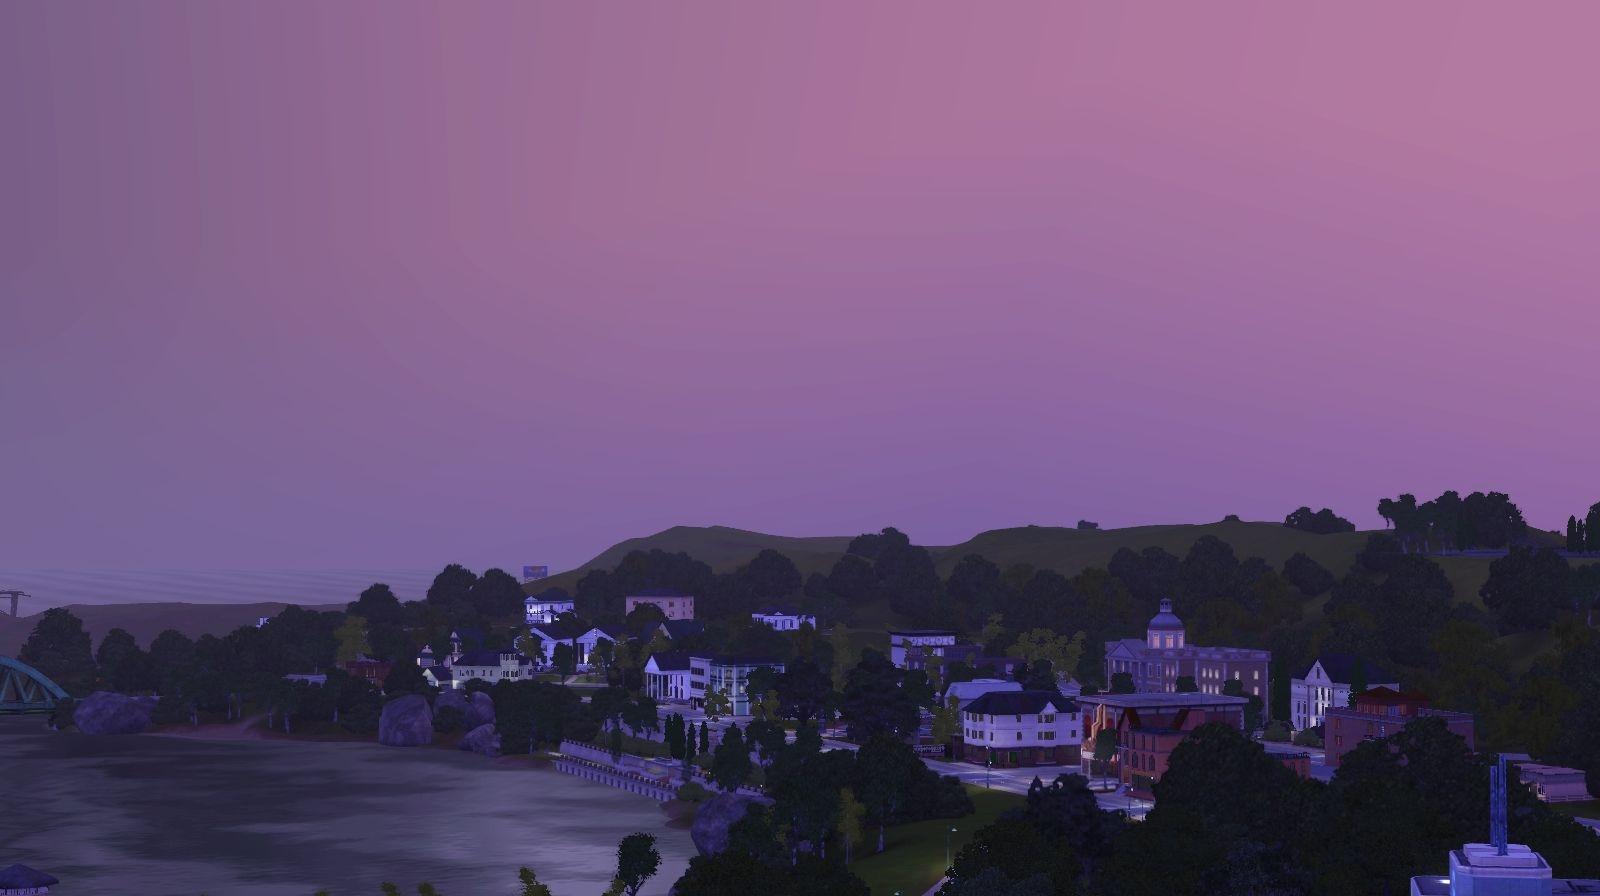 Twinbrook sunset